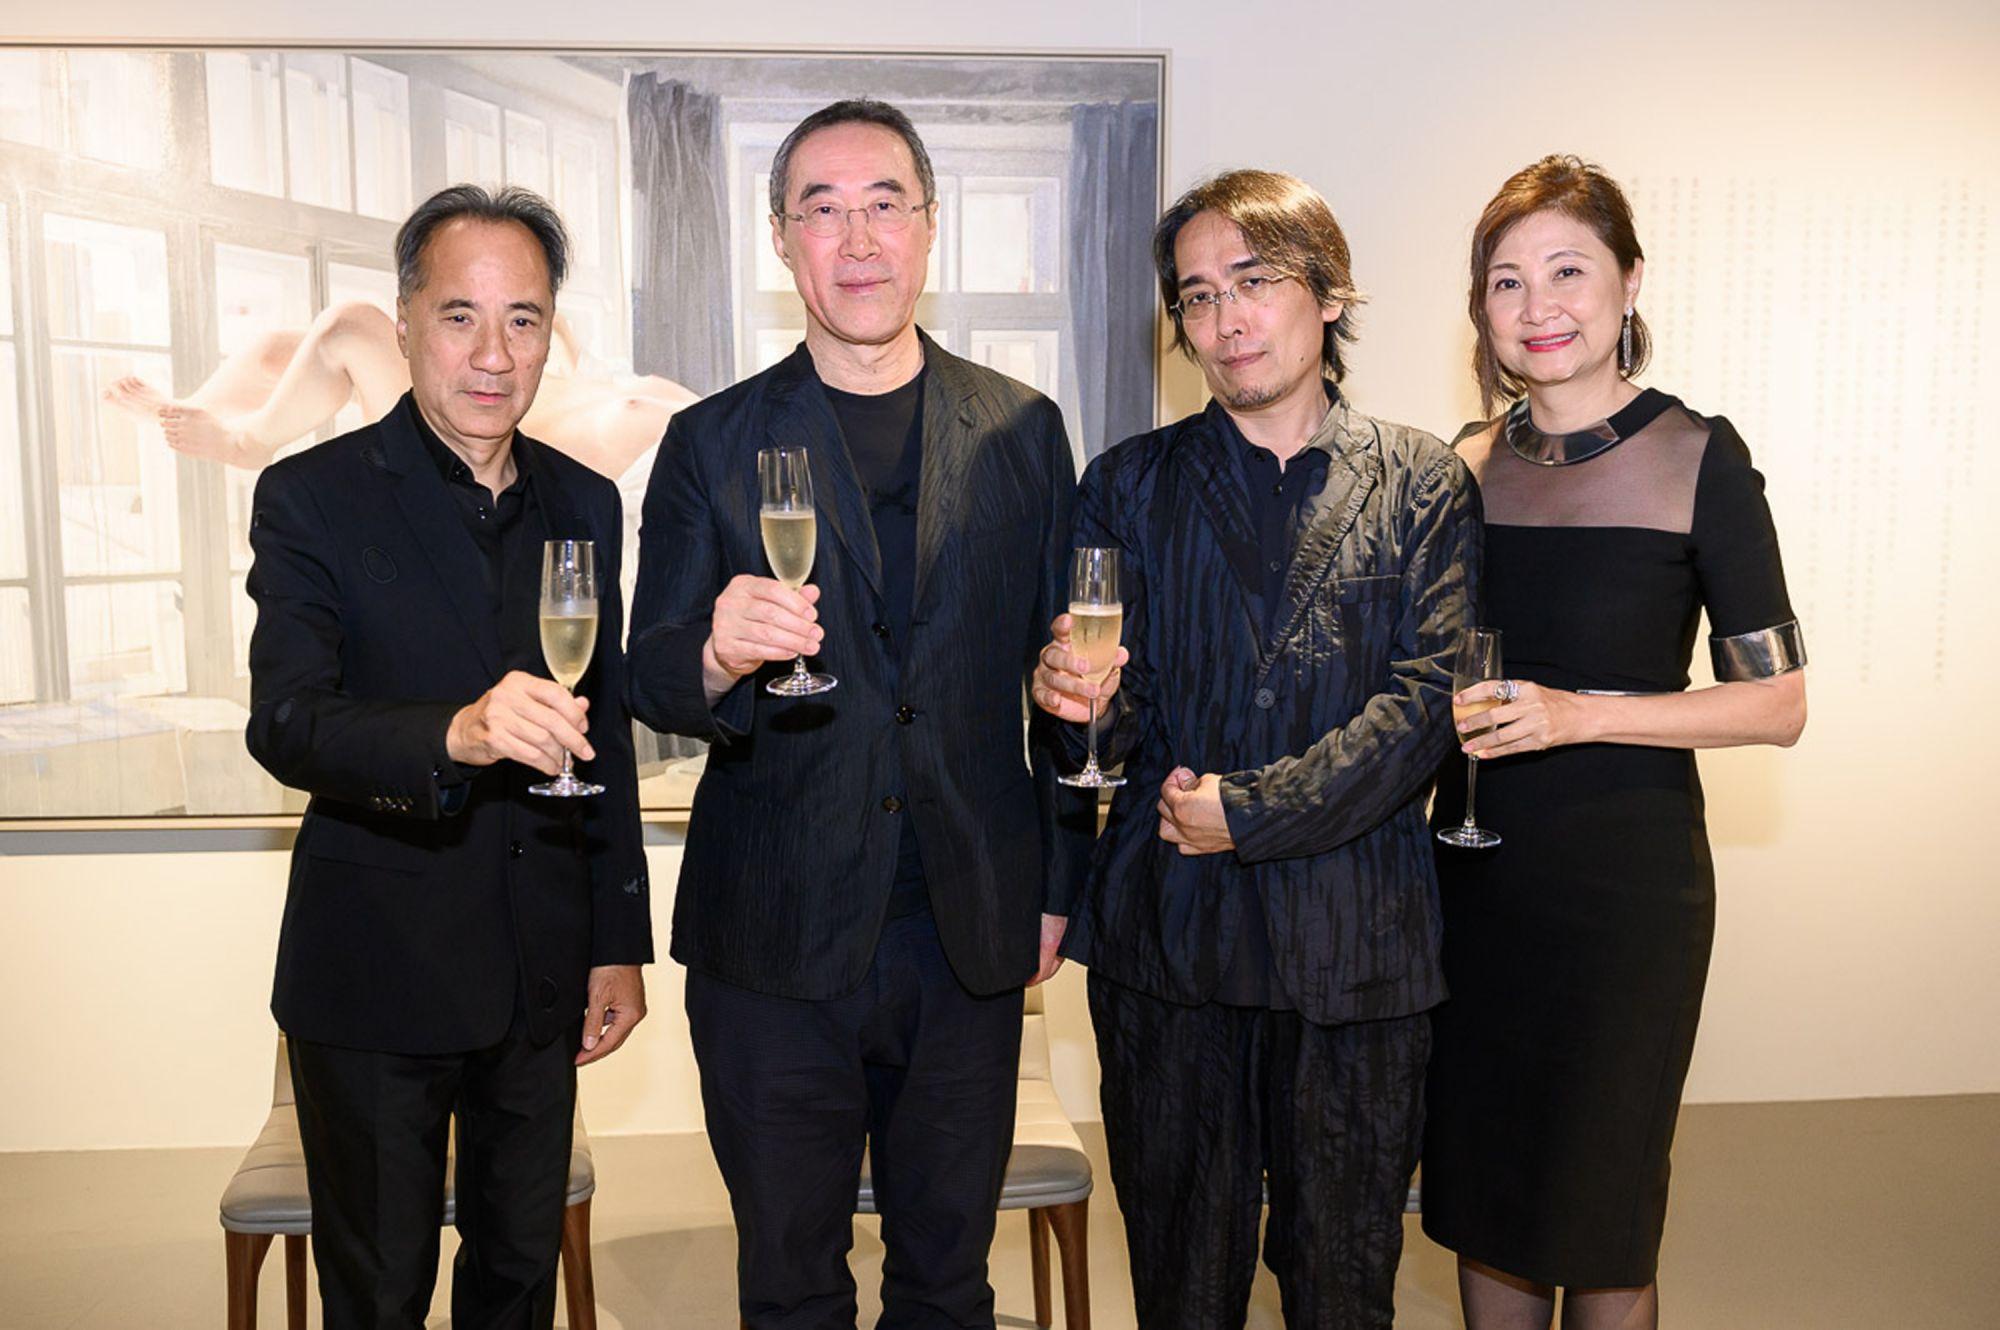 Edward Fung, Henry Tang, Atsushi Suwa, Catherine Kwai